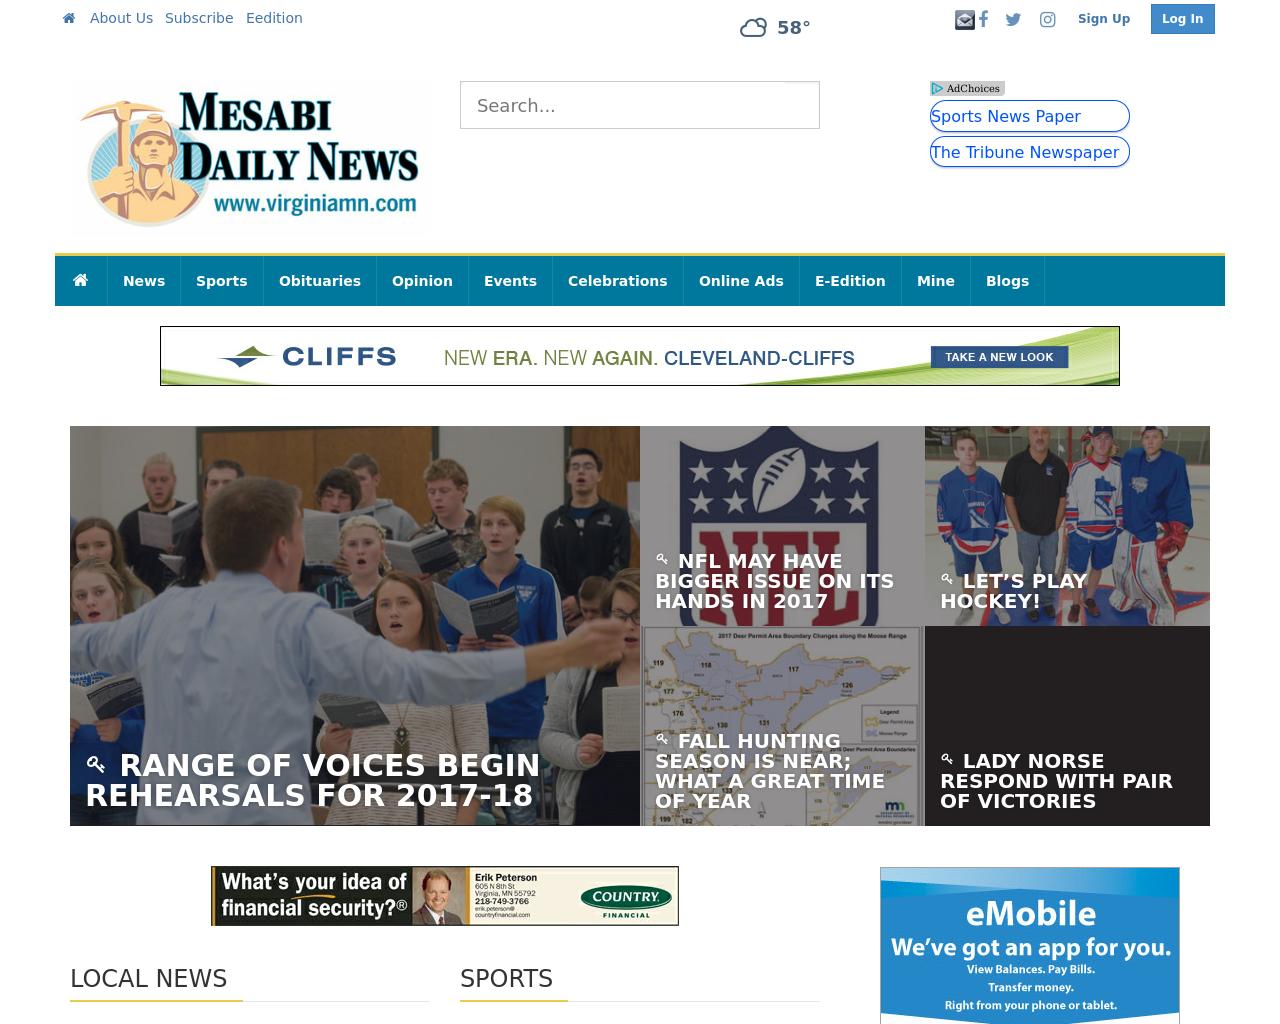 Mesabi-Daily-News-Advertising-Reviews-Pricing